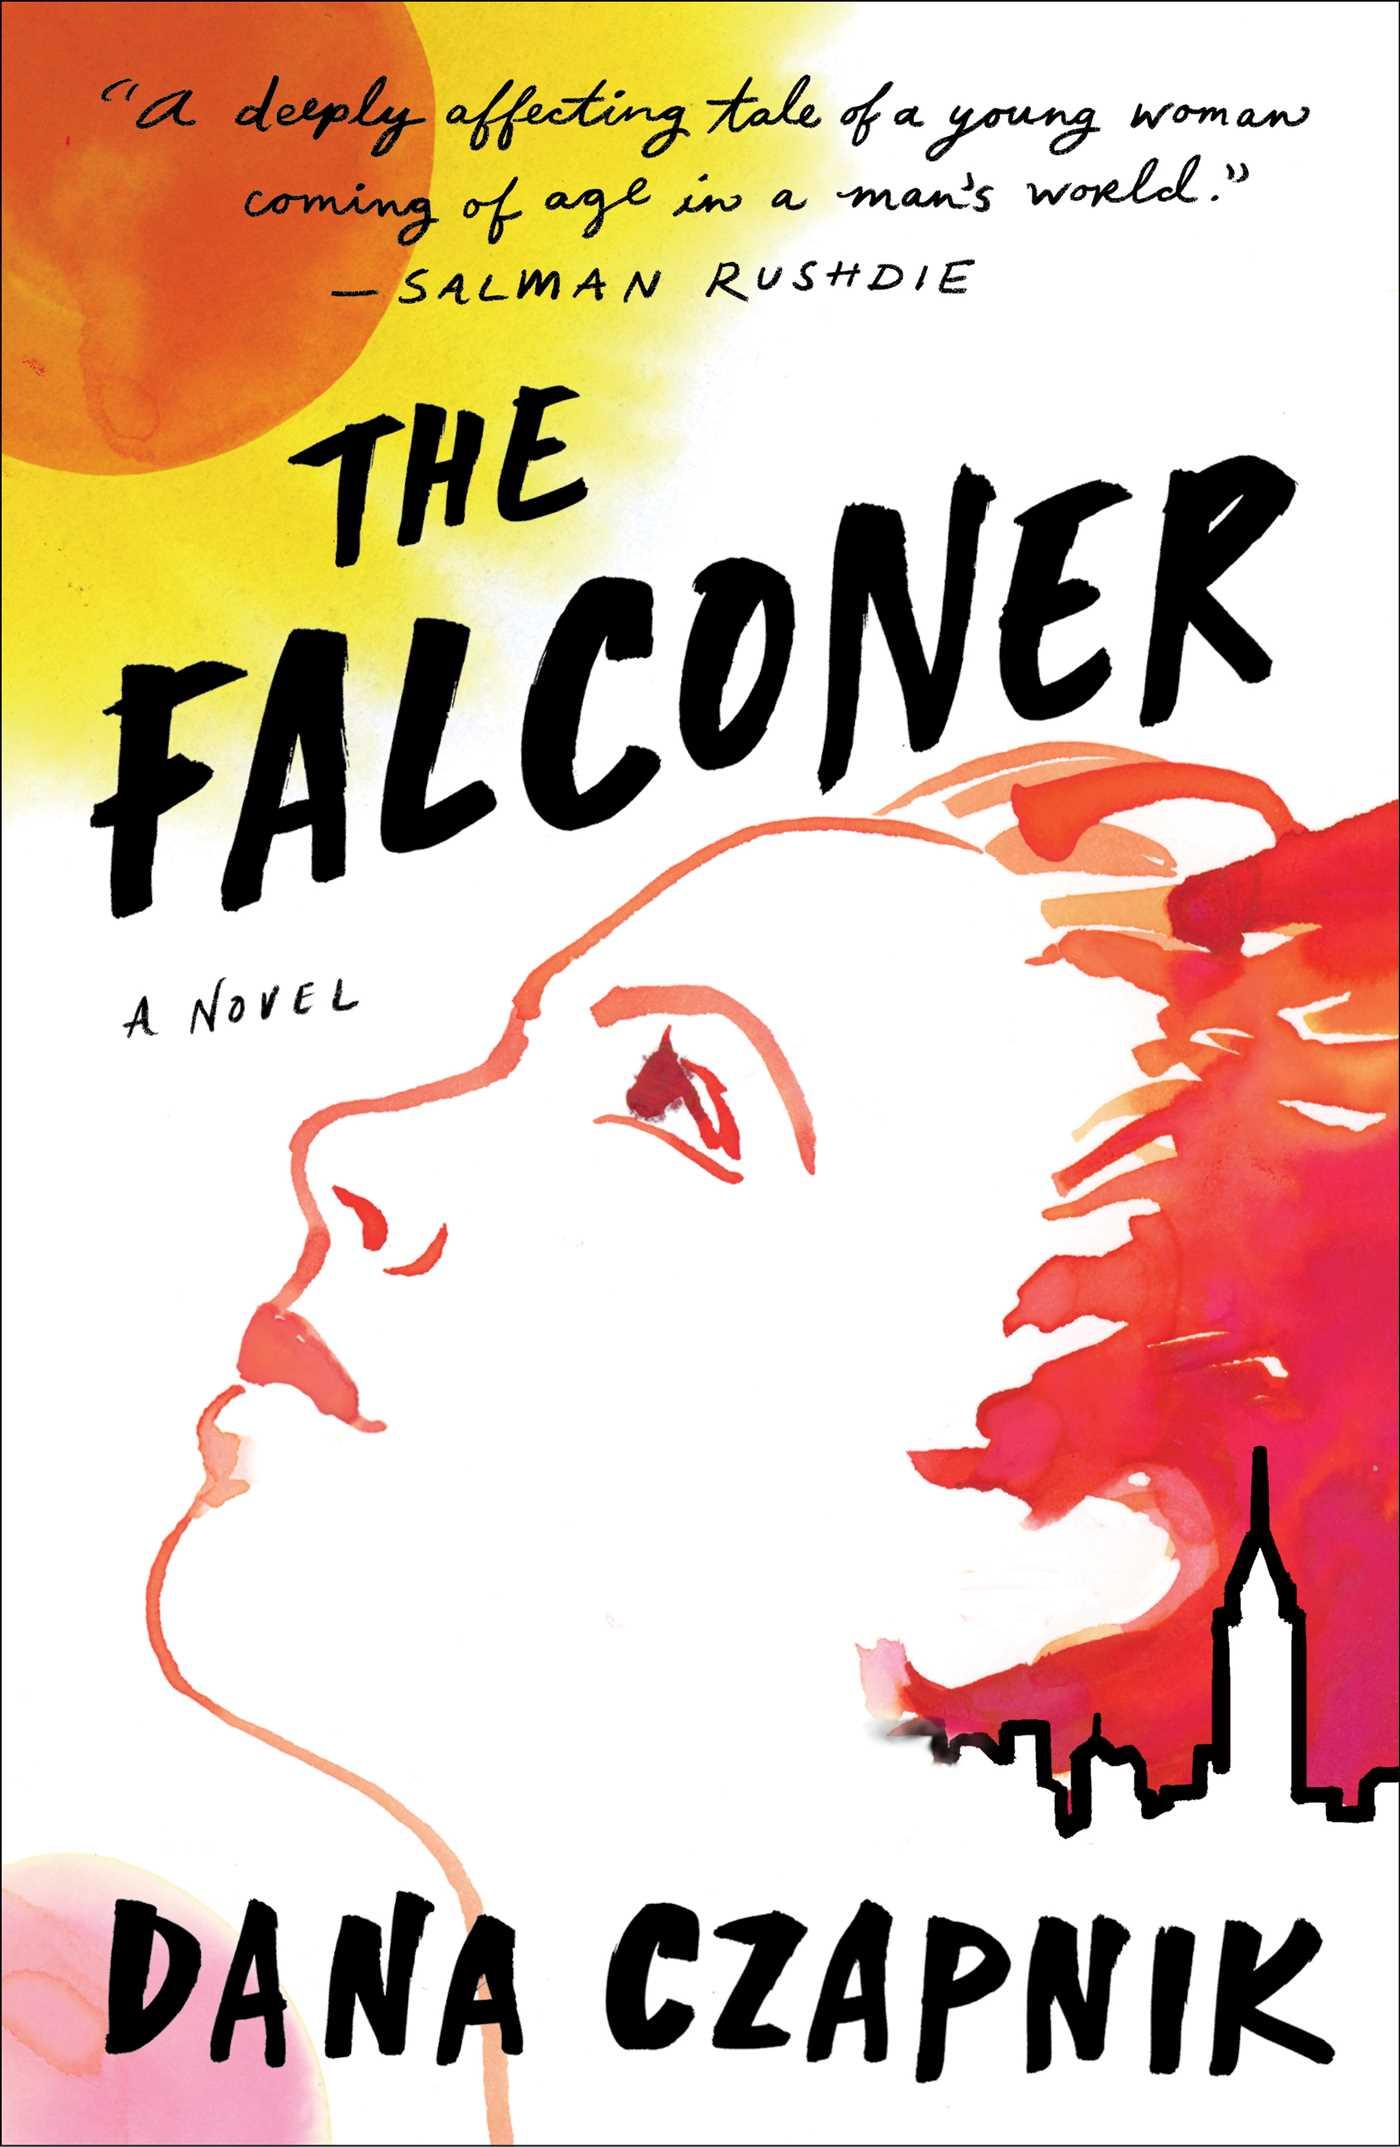 The falconer 9781501193224 hr